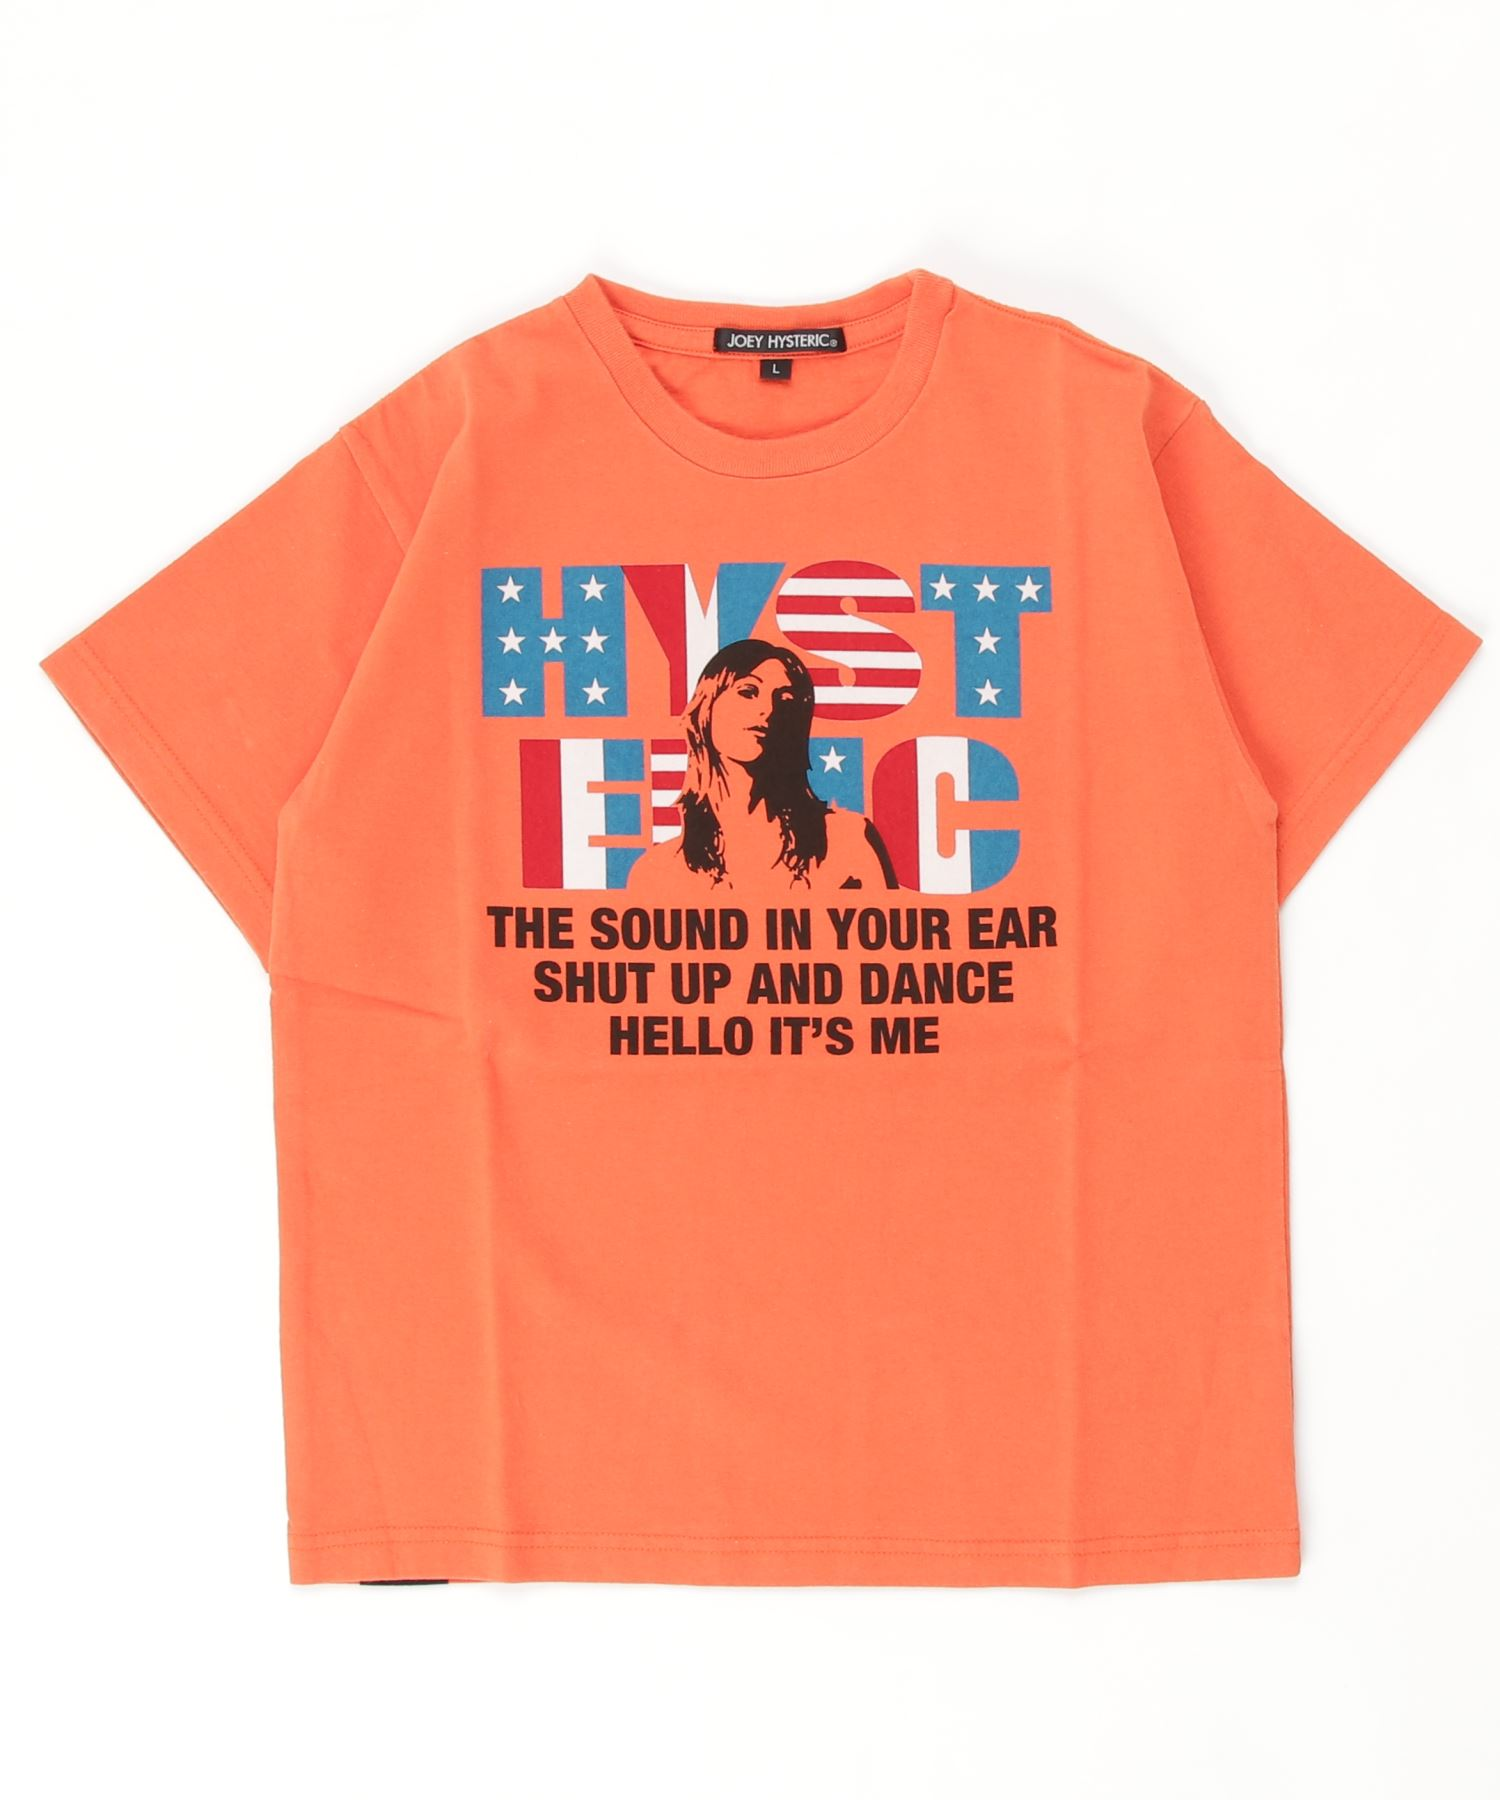 VOTE pt Tシャツ【L】